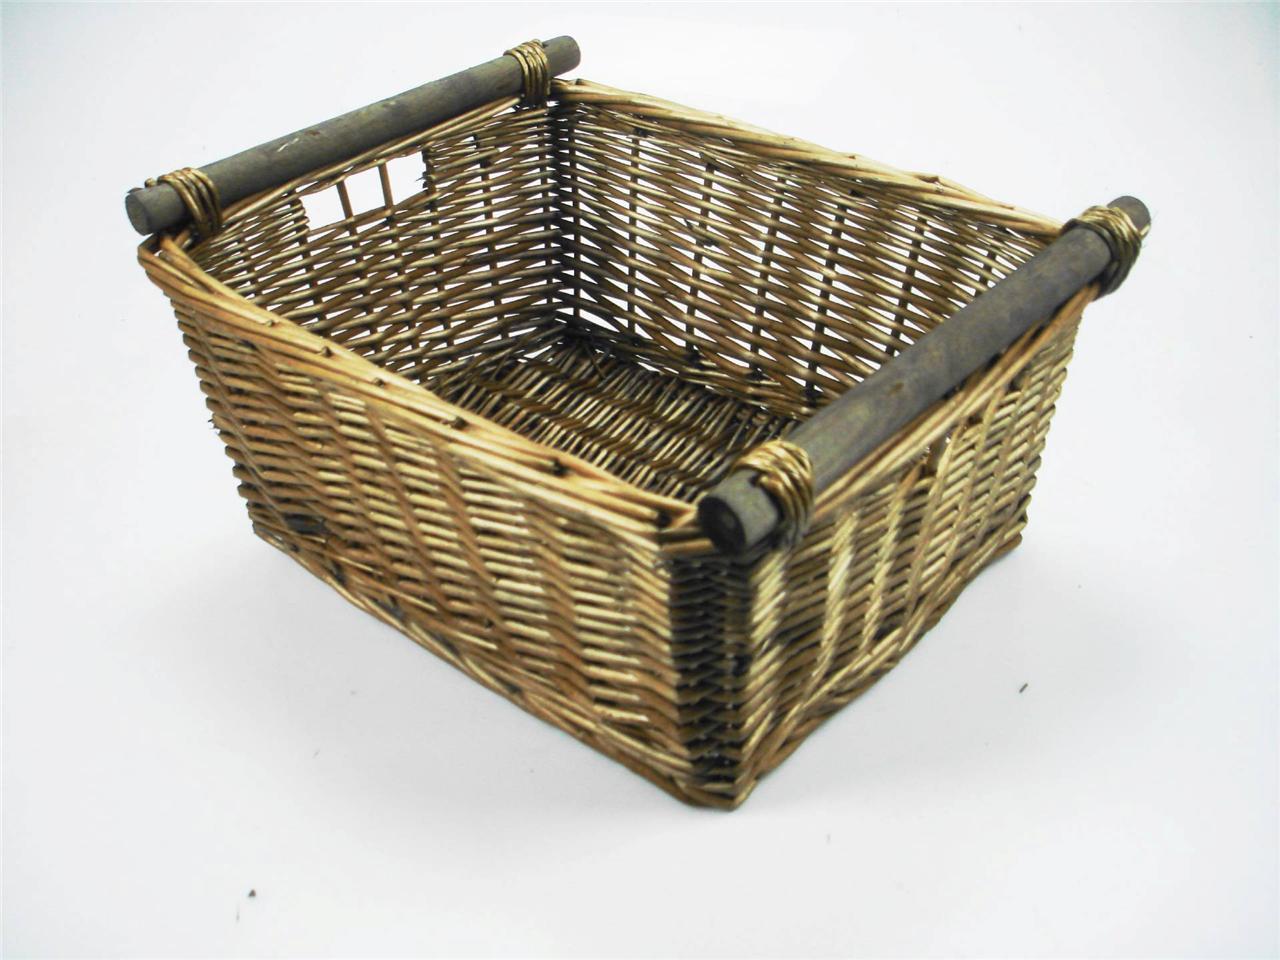 Wicker Hamper Baskets With Handles : Kitchen log wicker storage basket with handles xmas empty